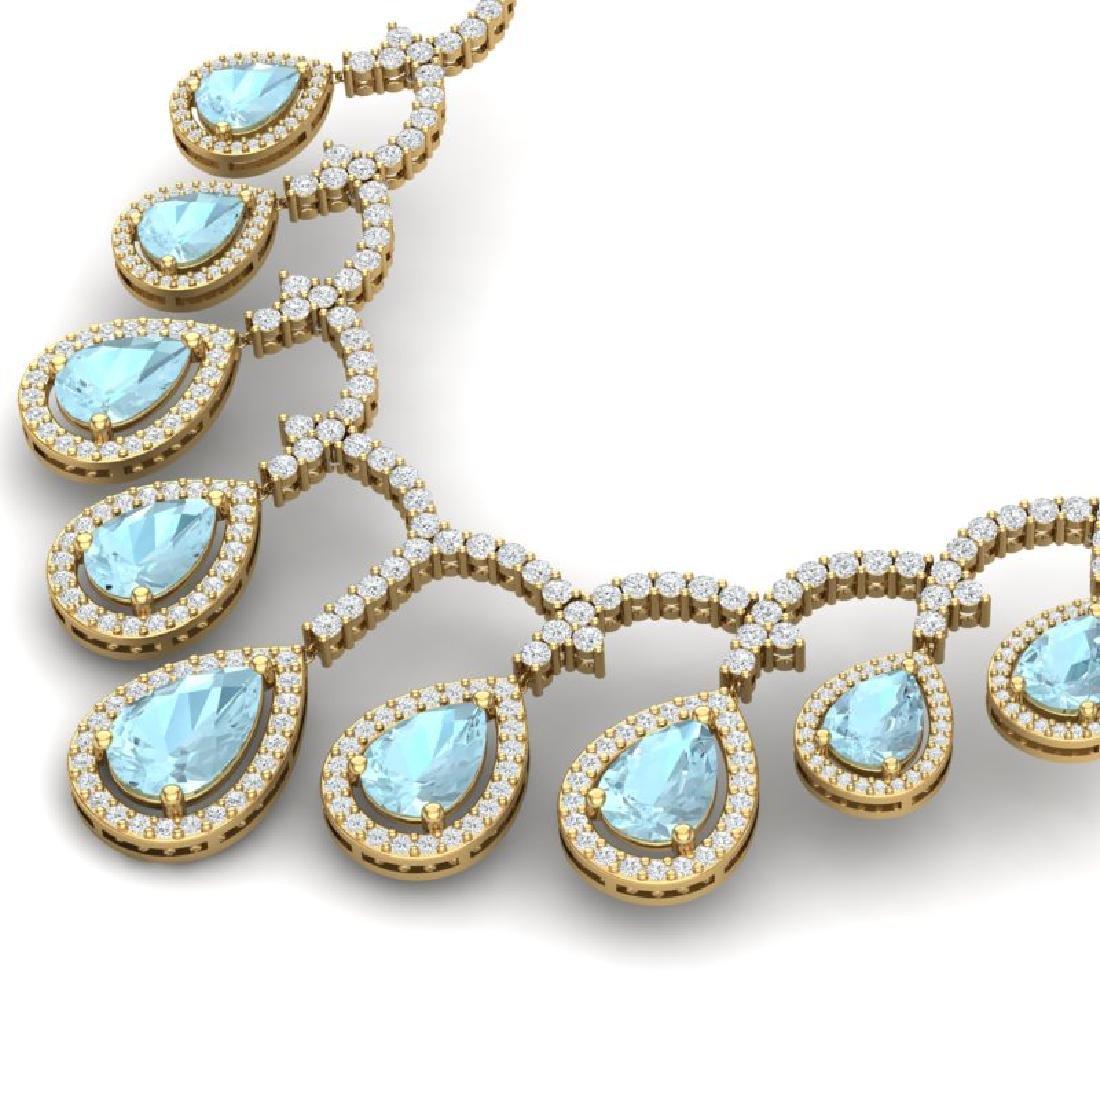 32.62 CTW Royalty Sky Topaz & VS Diamond Necklace 18K